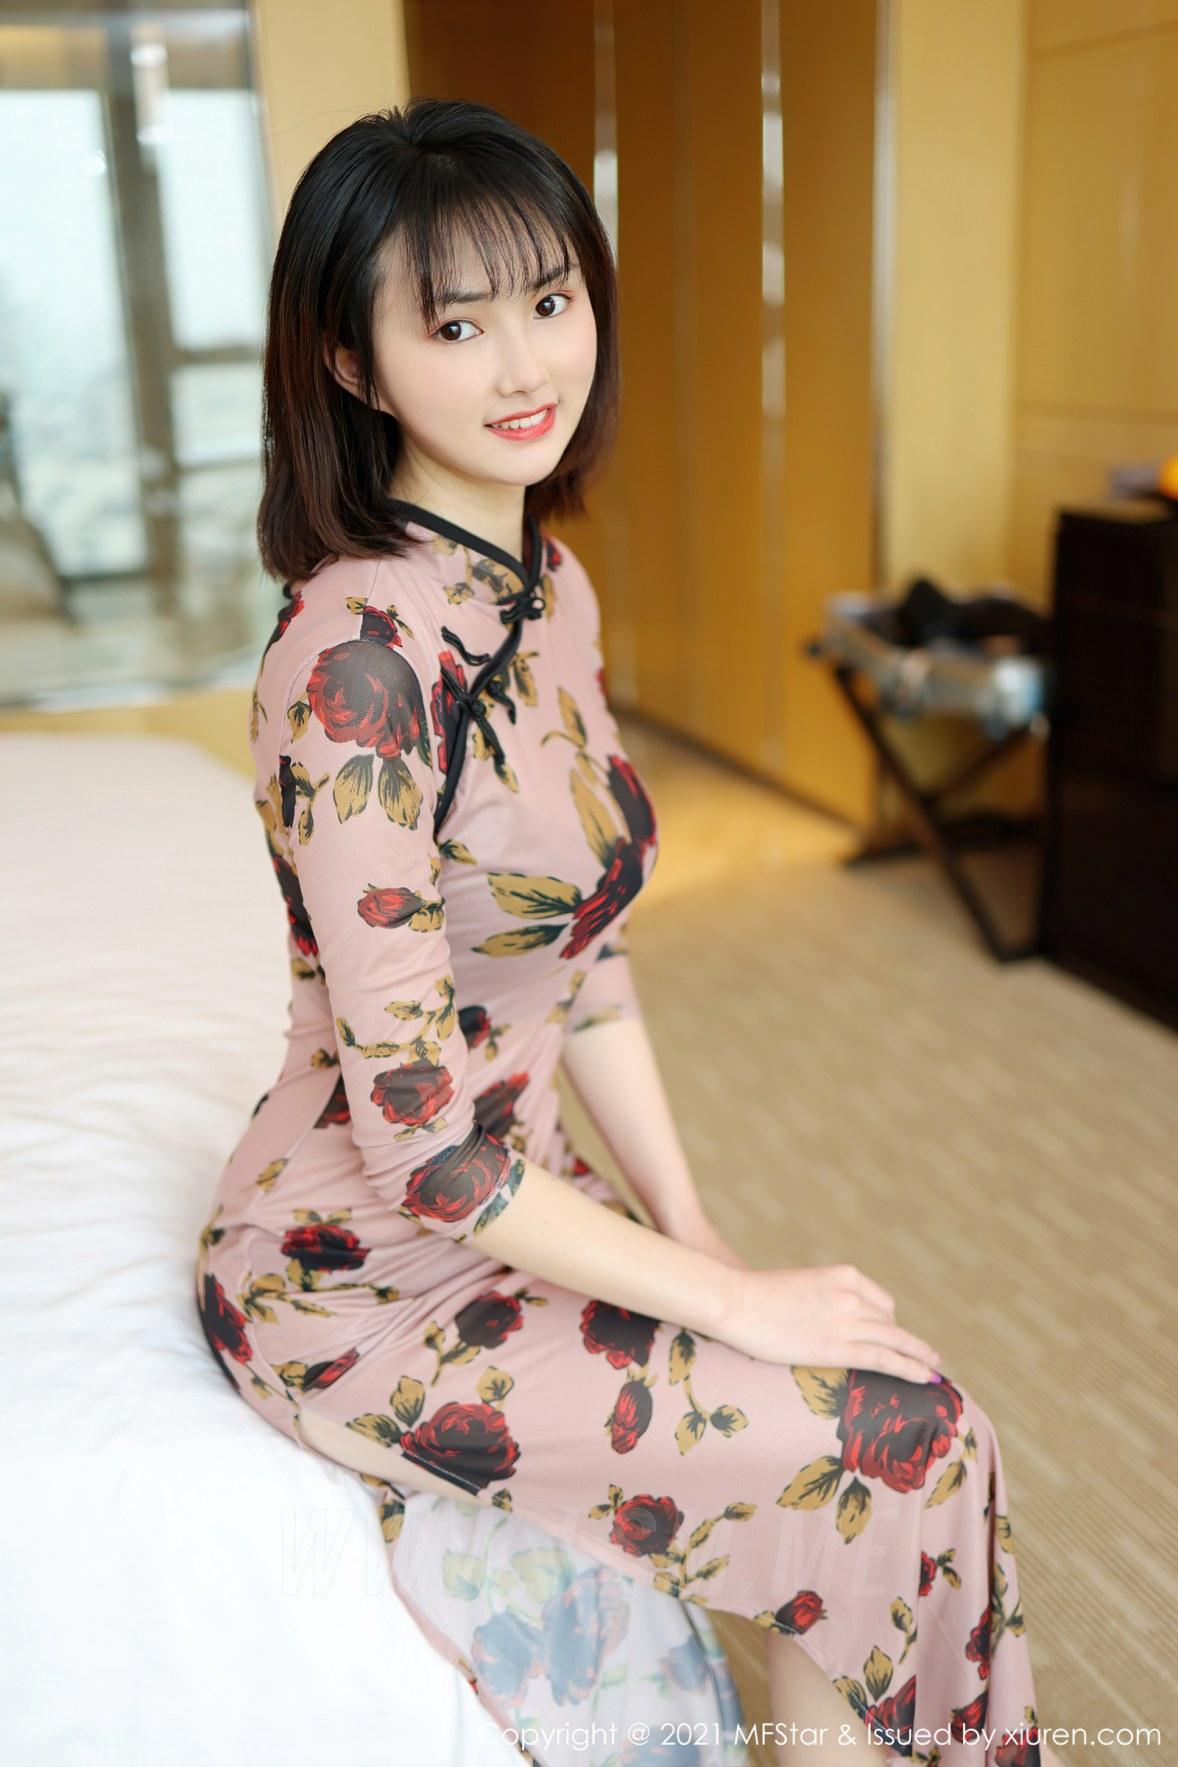 MFStar 模范学院 Vol.483 肉感妹子古典旗袍  墨韩 新人模特... - 3